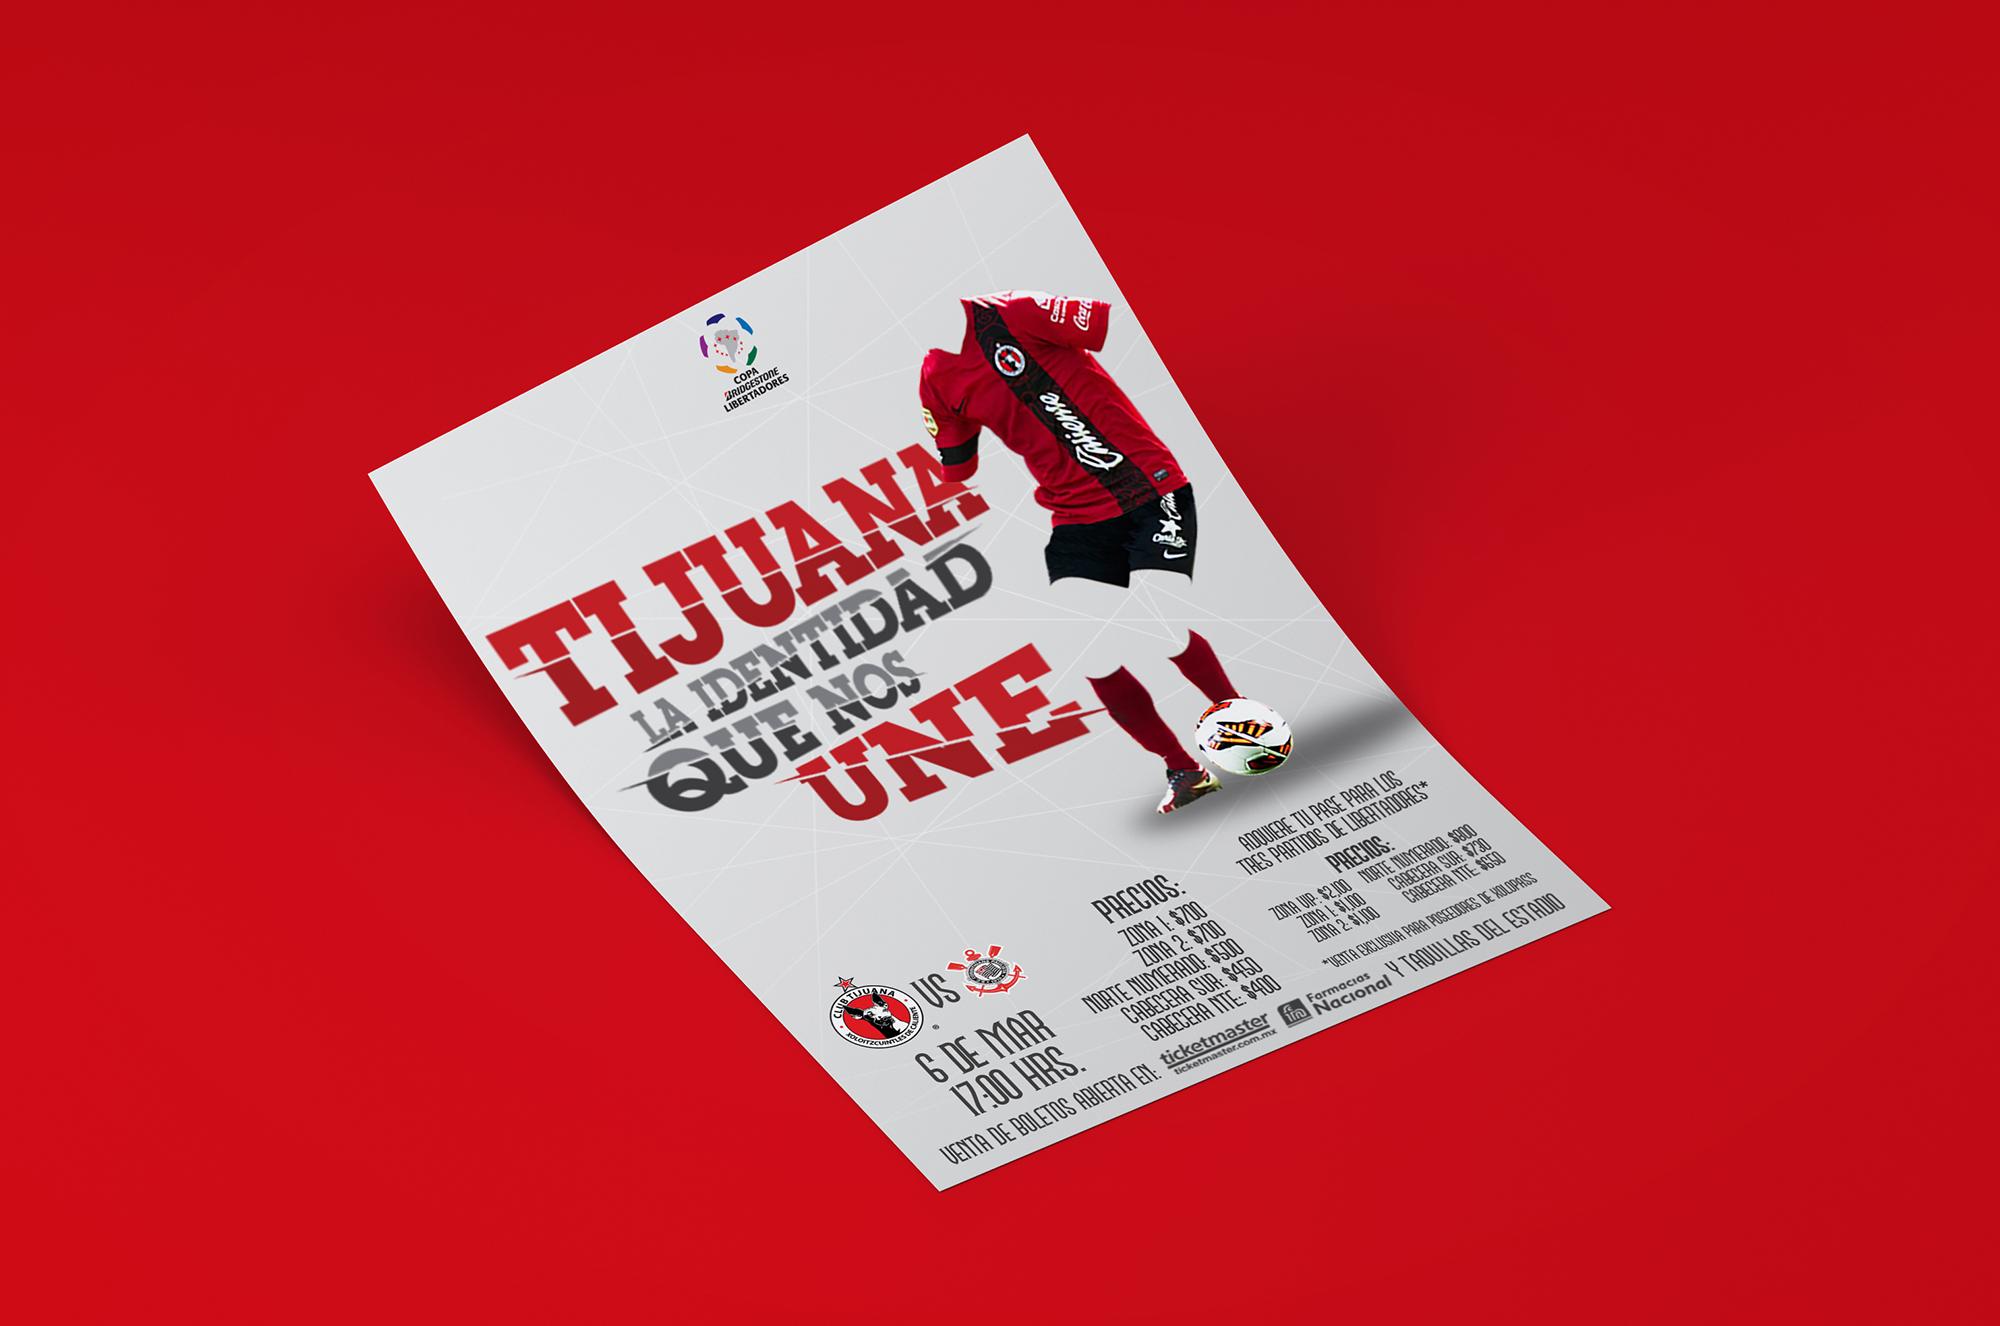 raniev-rod-alvarez-diseño-gráfico-queretaro-club-tijuana-1-poster-main